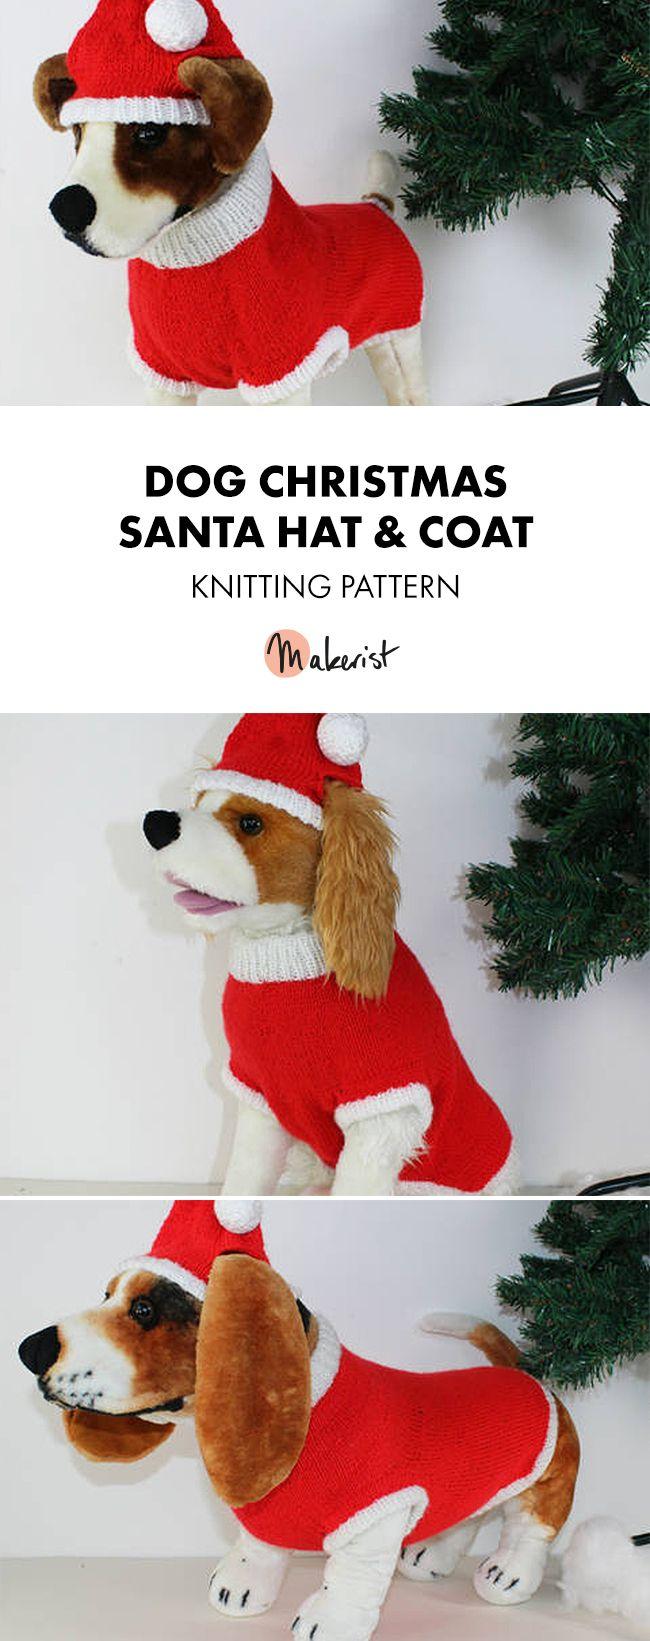 Dog Christmas Santa Hat And Coat Circular Christmas Dog Fun Christmas Outfits Dog Clothes Diy